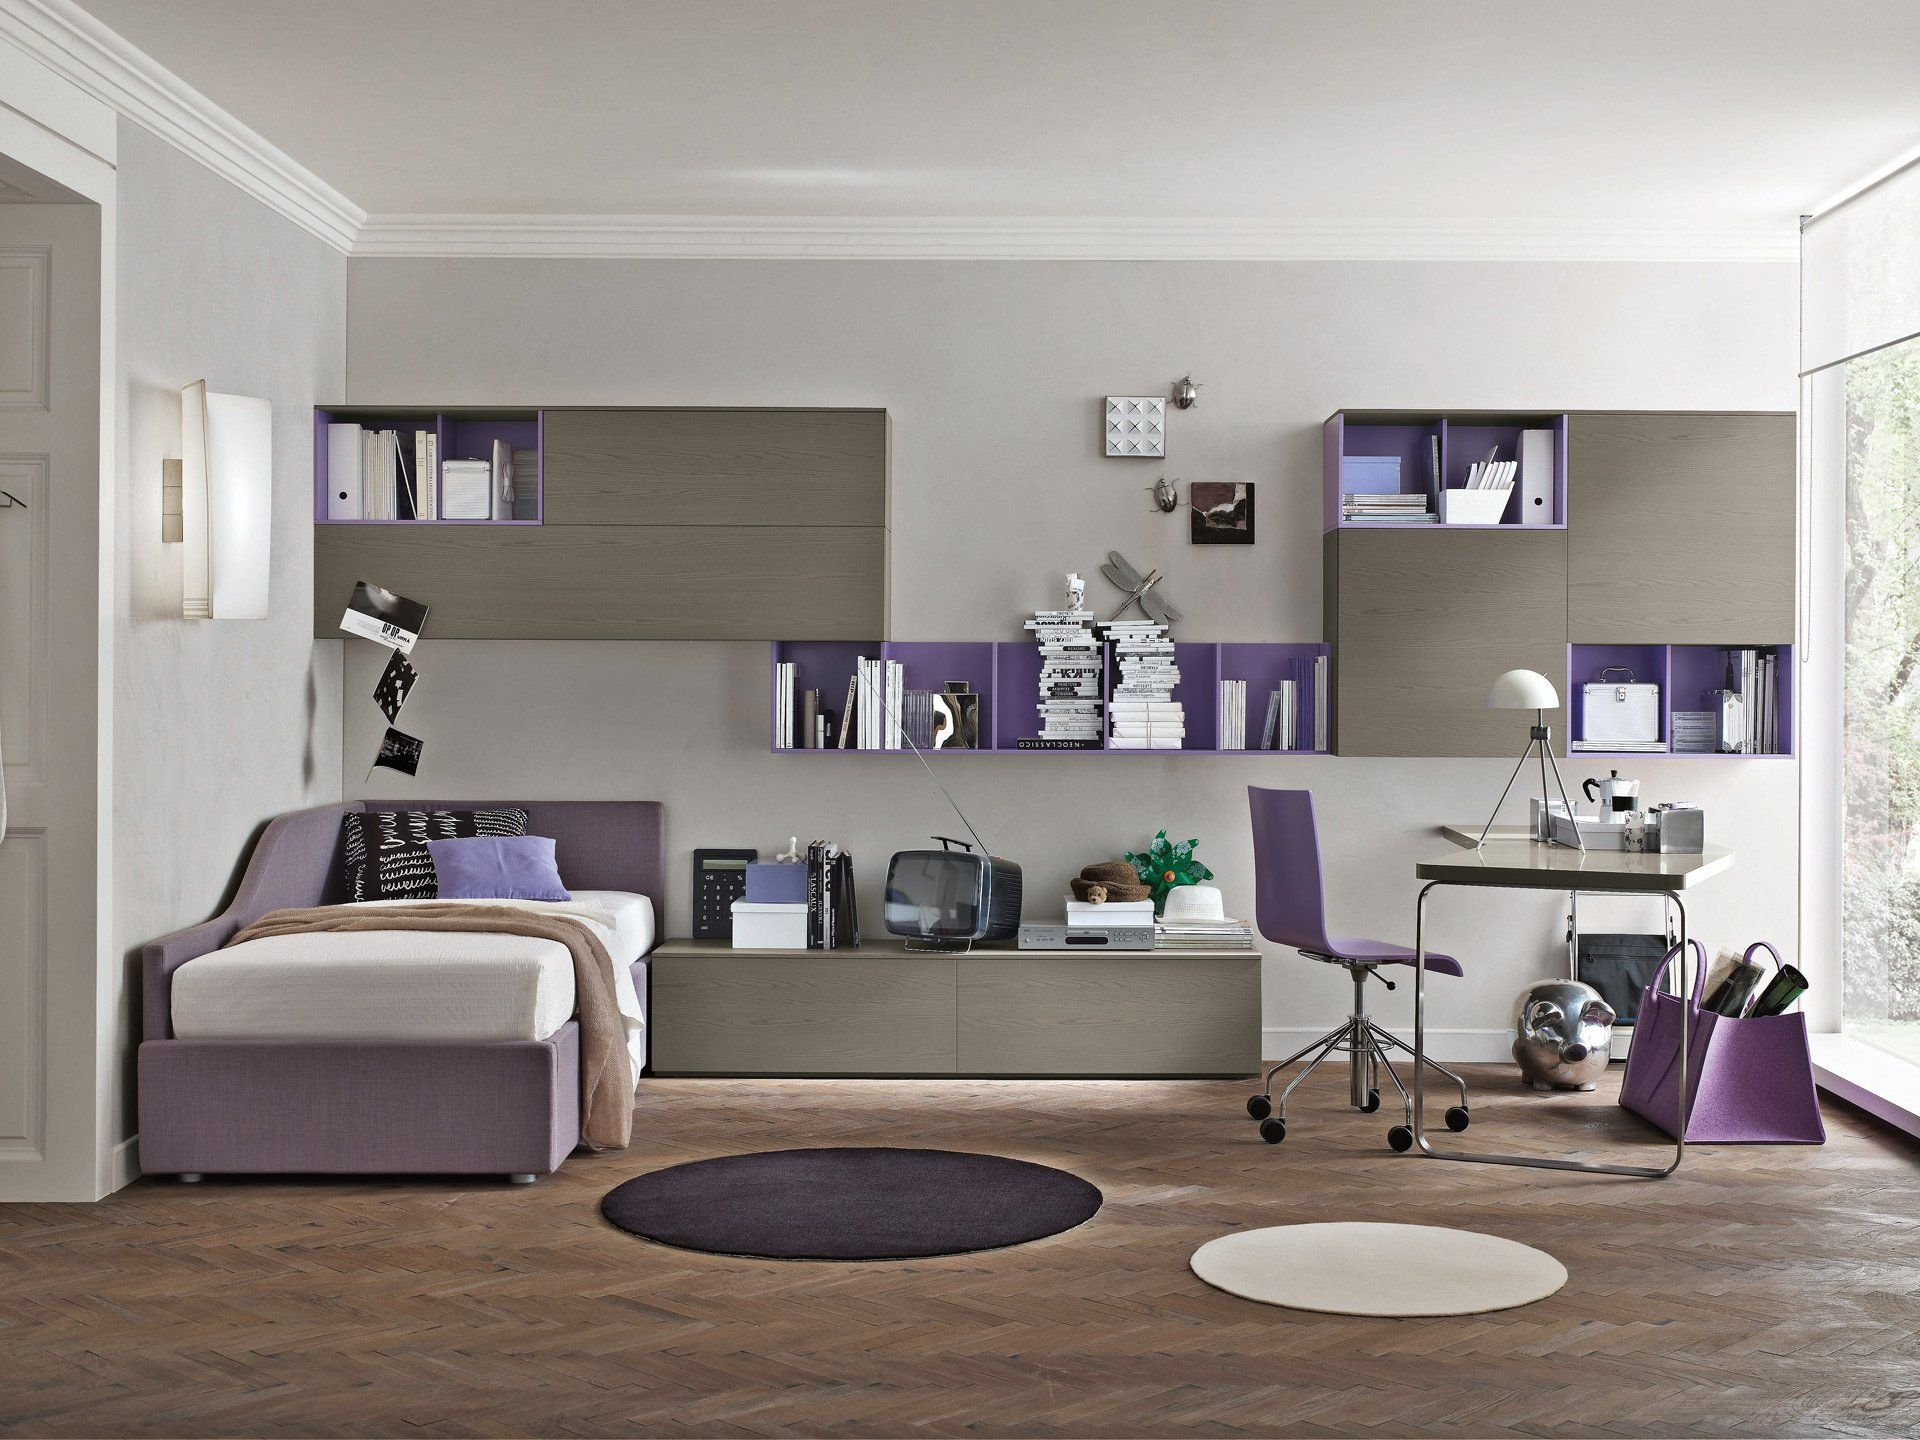 Modern Childrens Bedroom Furniture Tomasella Tommy Young Modern Kids Room Inspiration